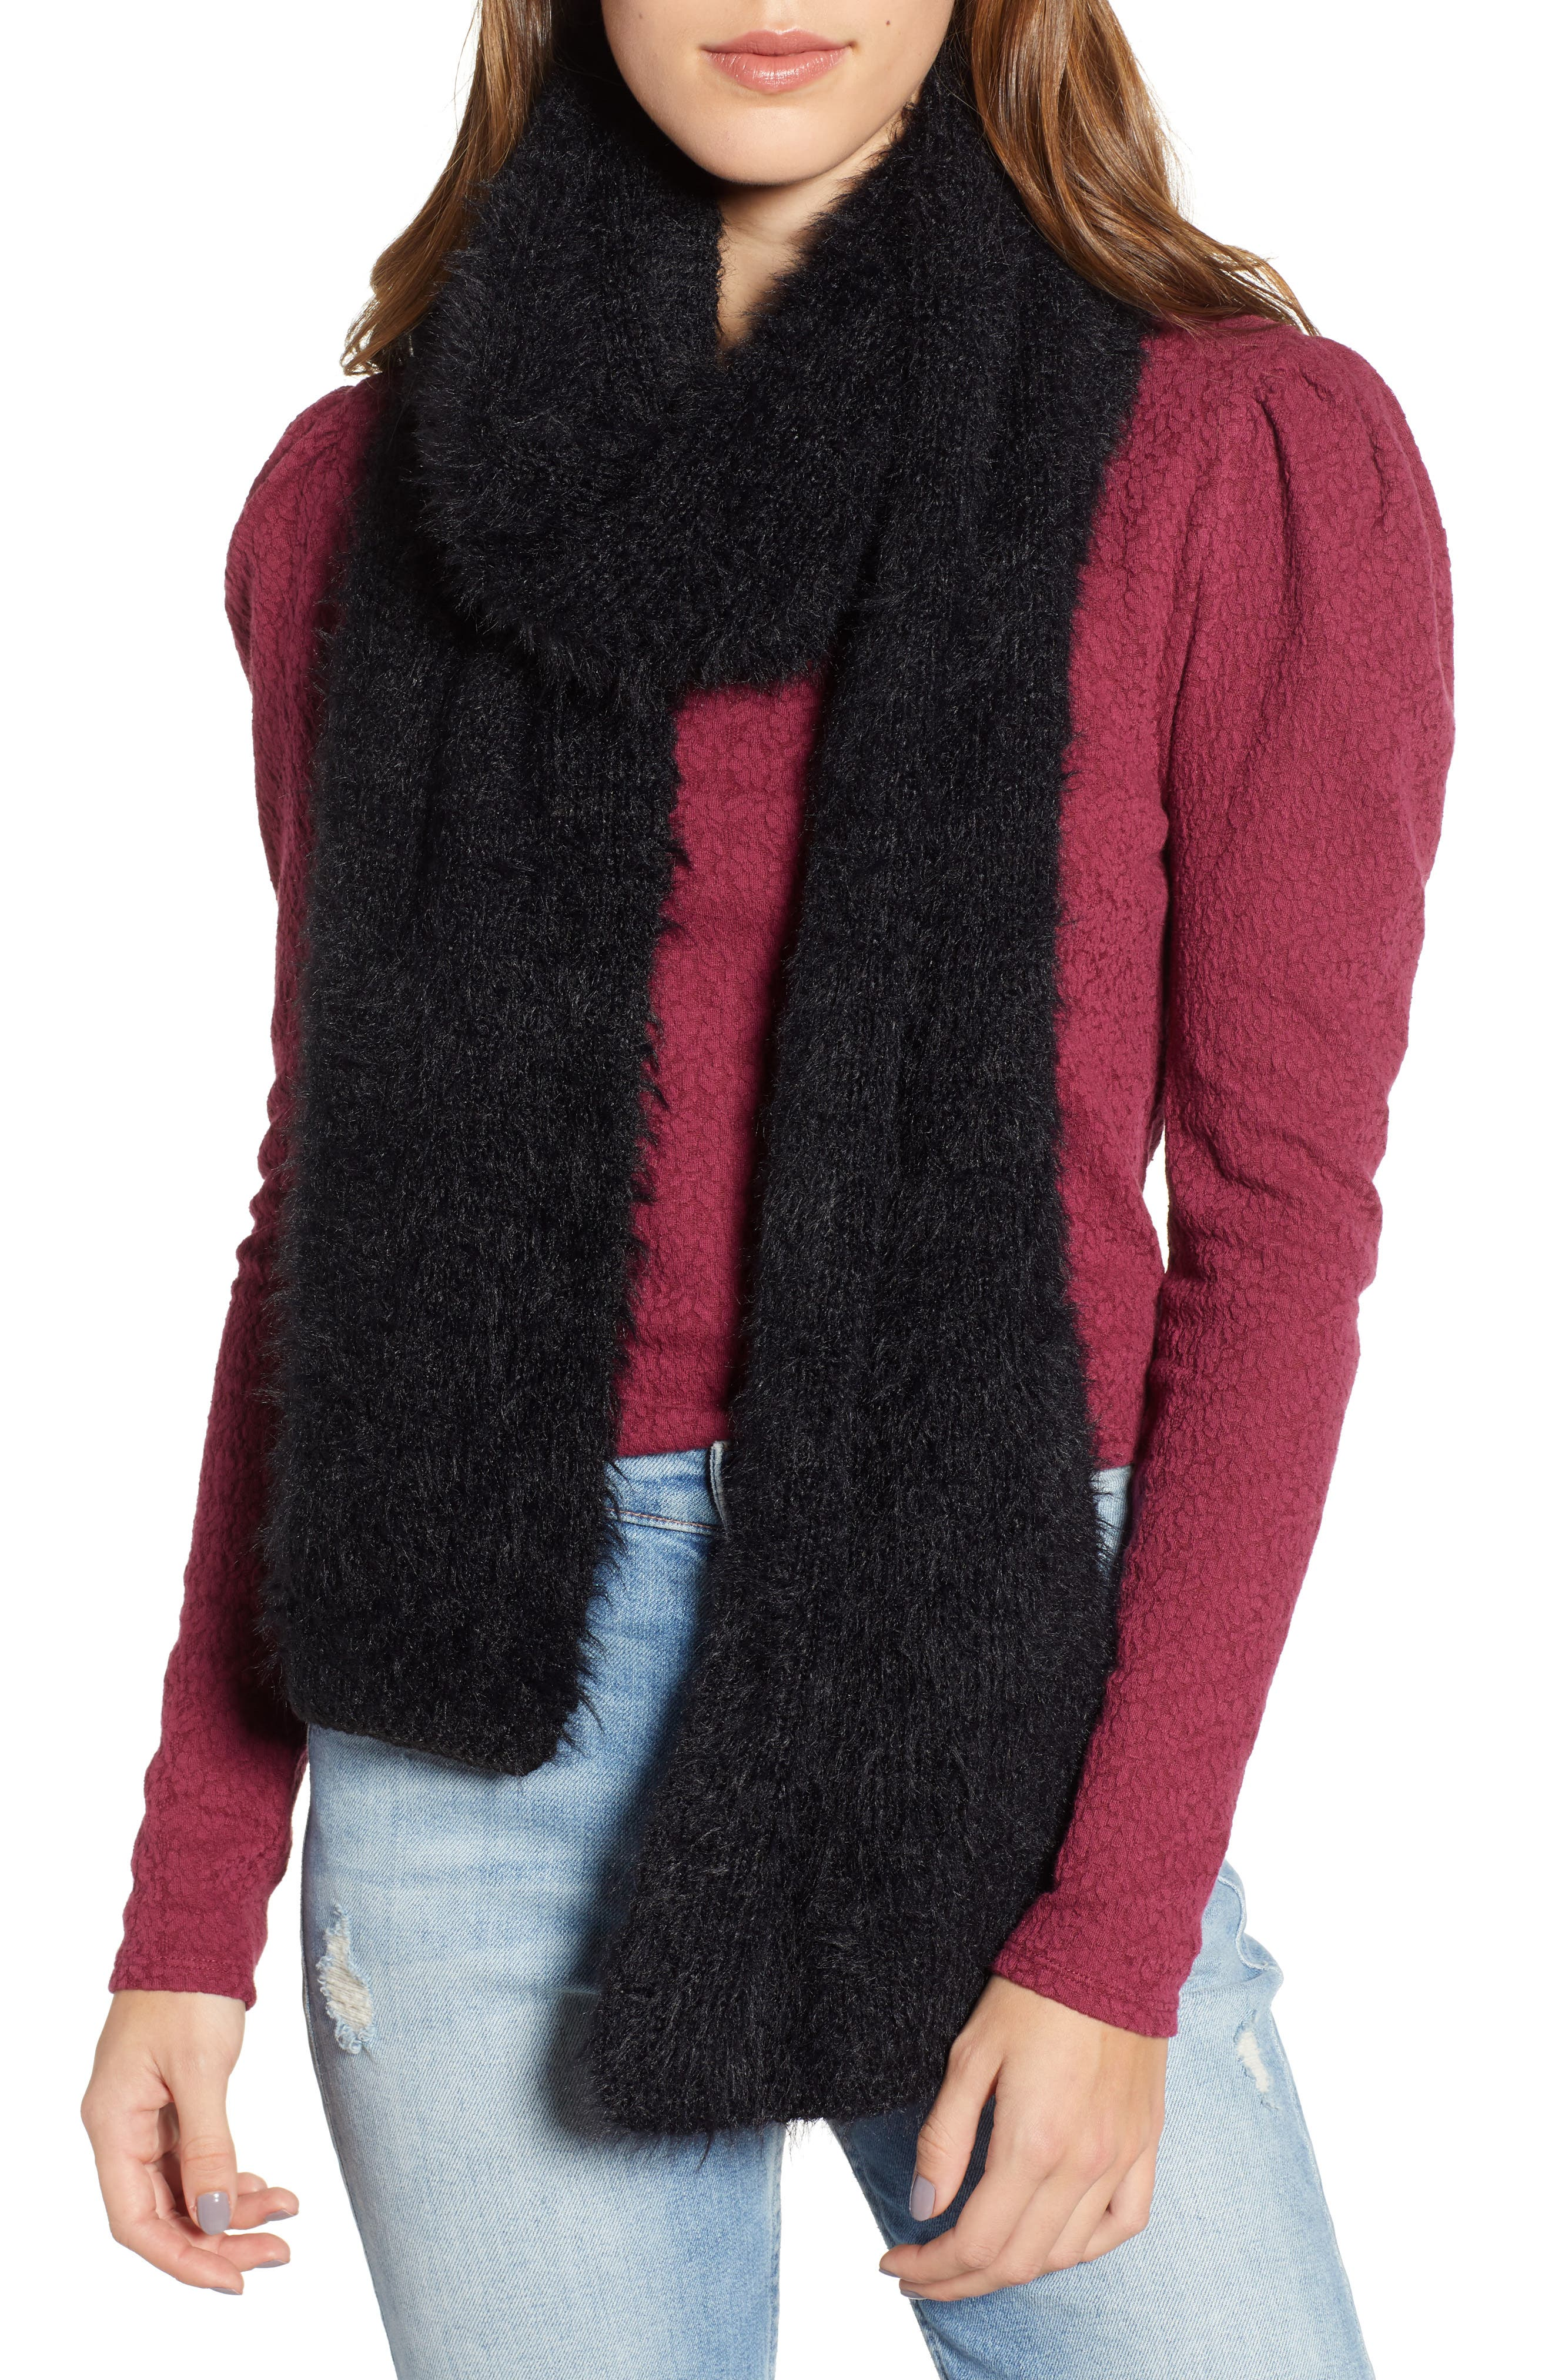 Eyleash Knit Muffler,                         Main,                         color, BLACK